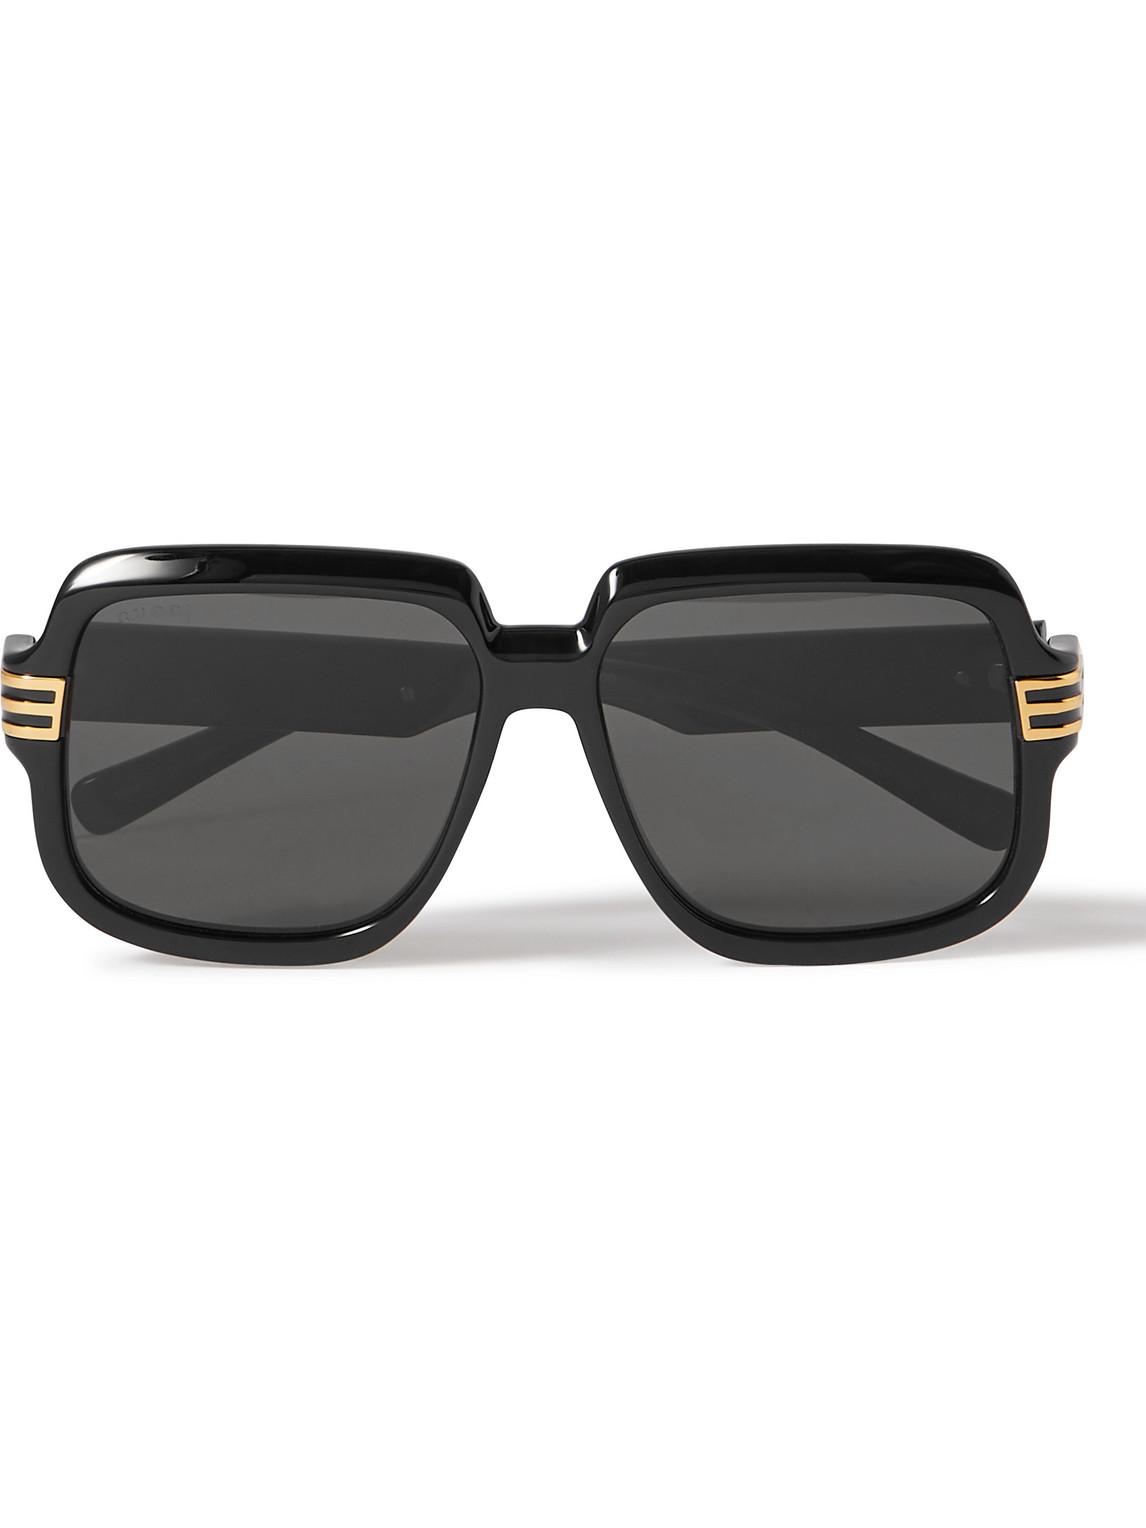 Gucci - Square-Frame Acetate And Gold-Tone Sunglasses - Men - Black